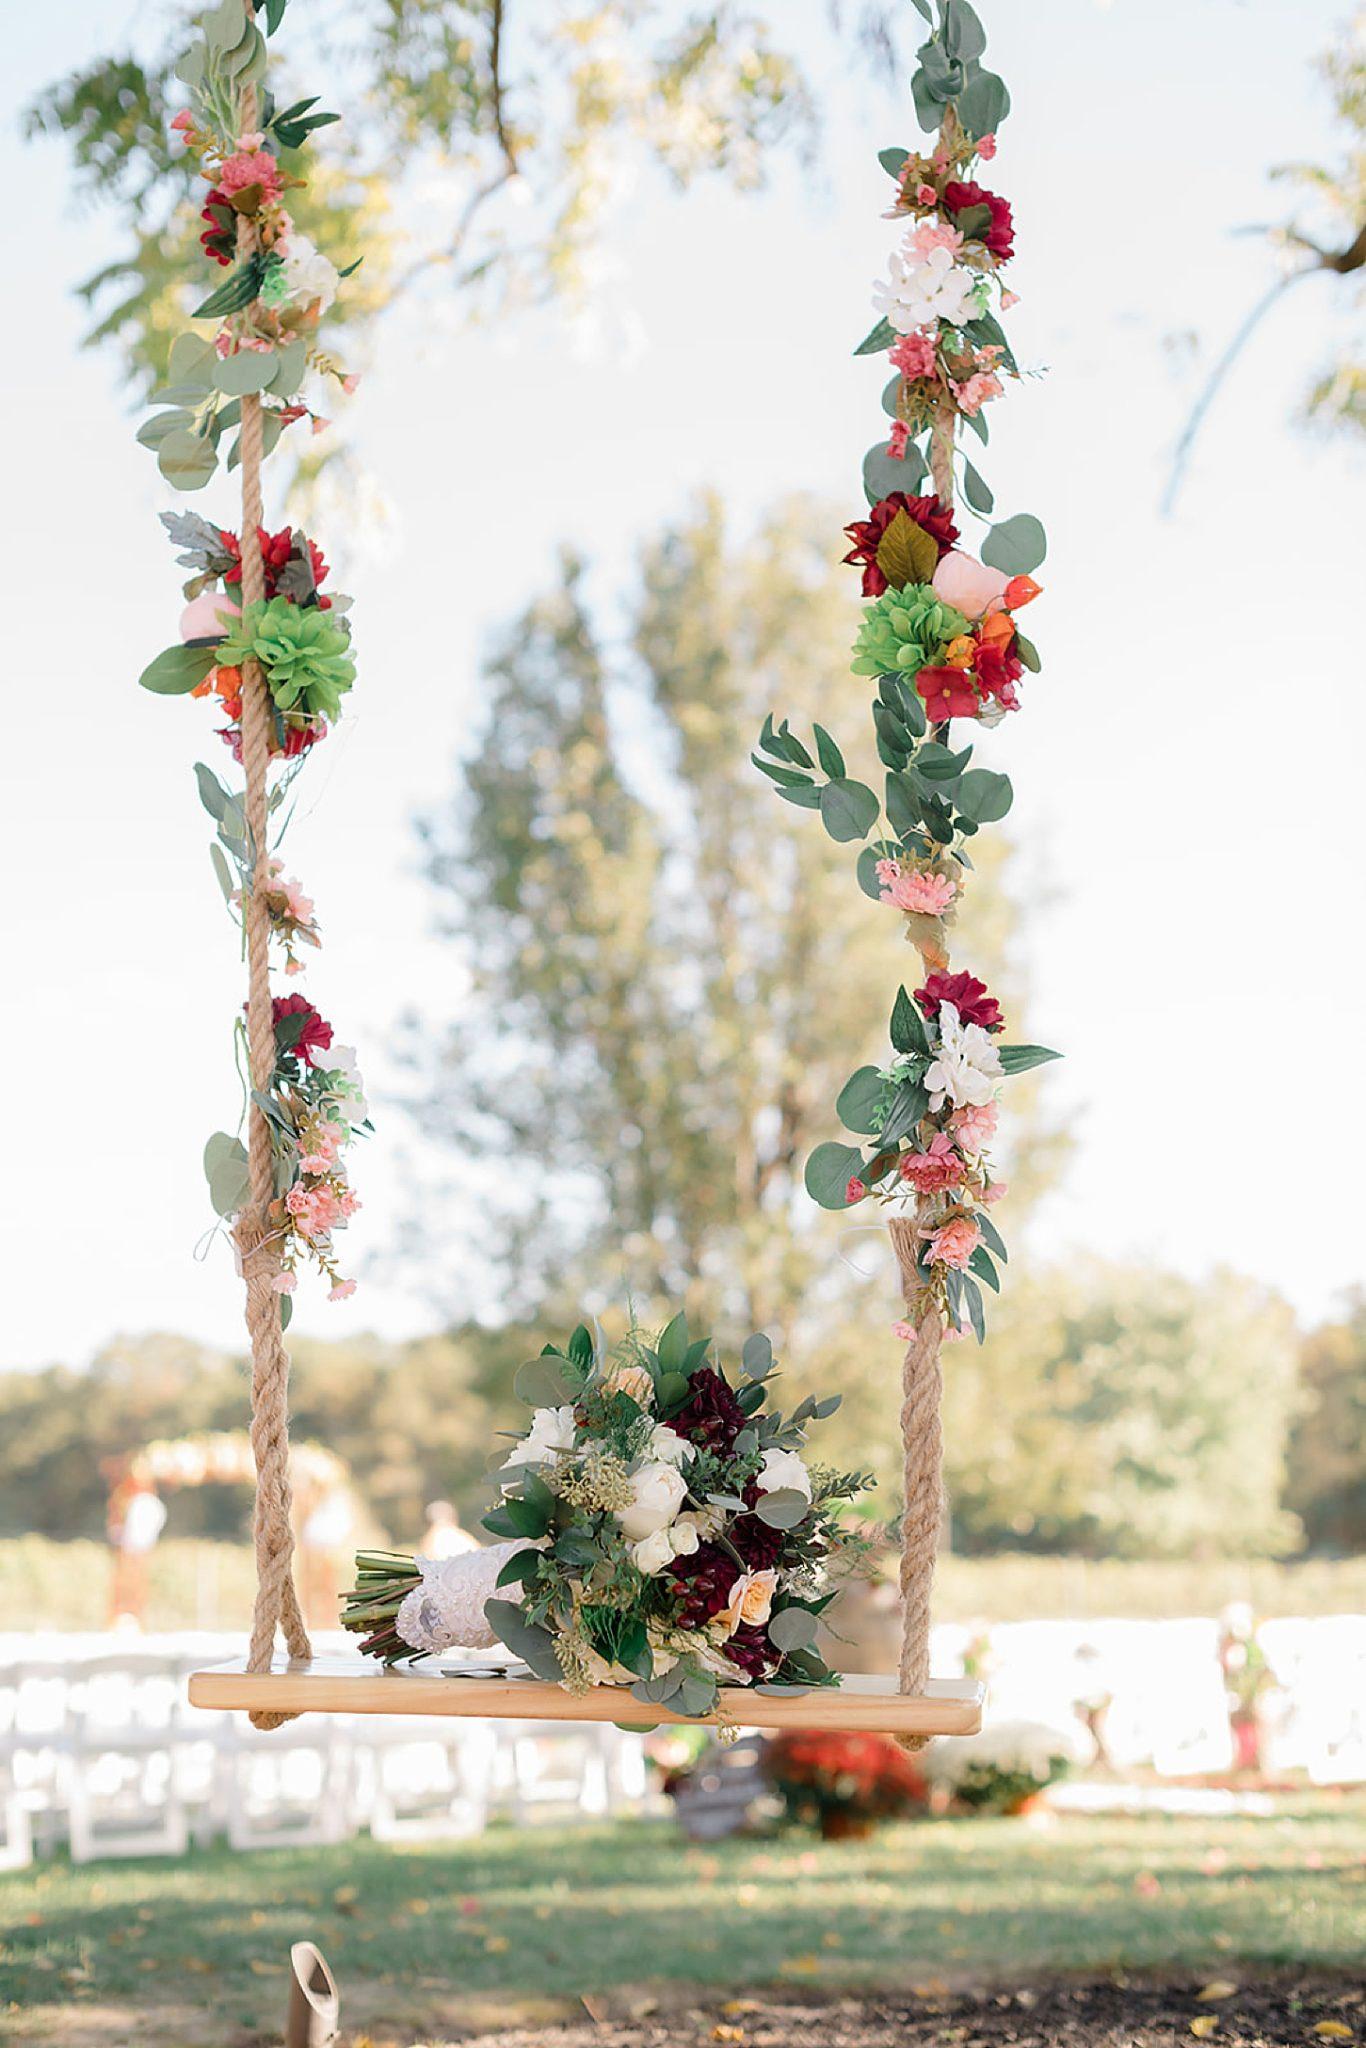 Valenzano Winery Vitners Pavillion Wedding Photography by Magdalena Studios 0012 scaled